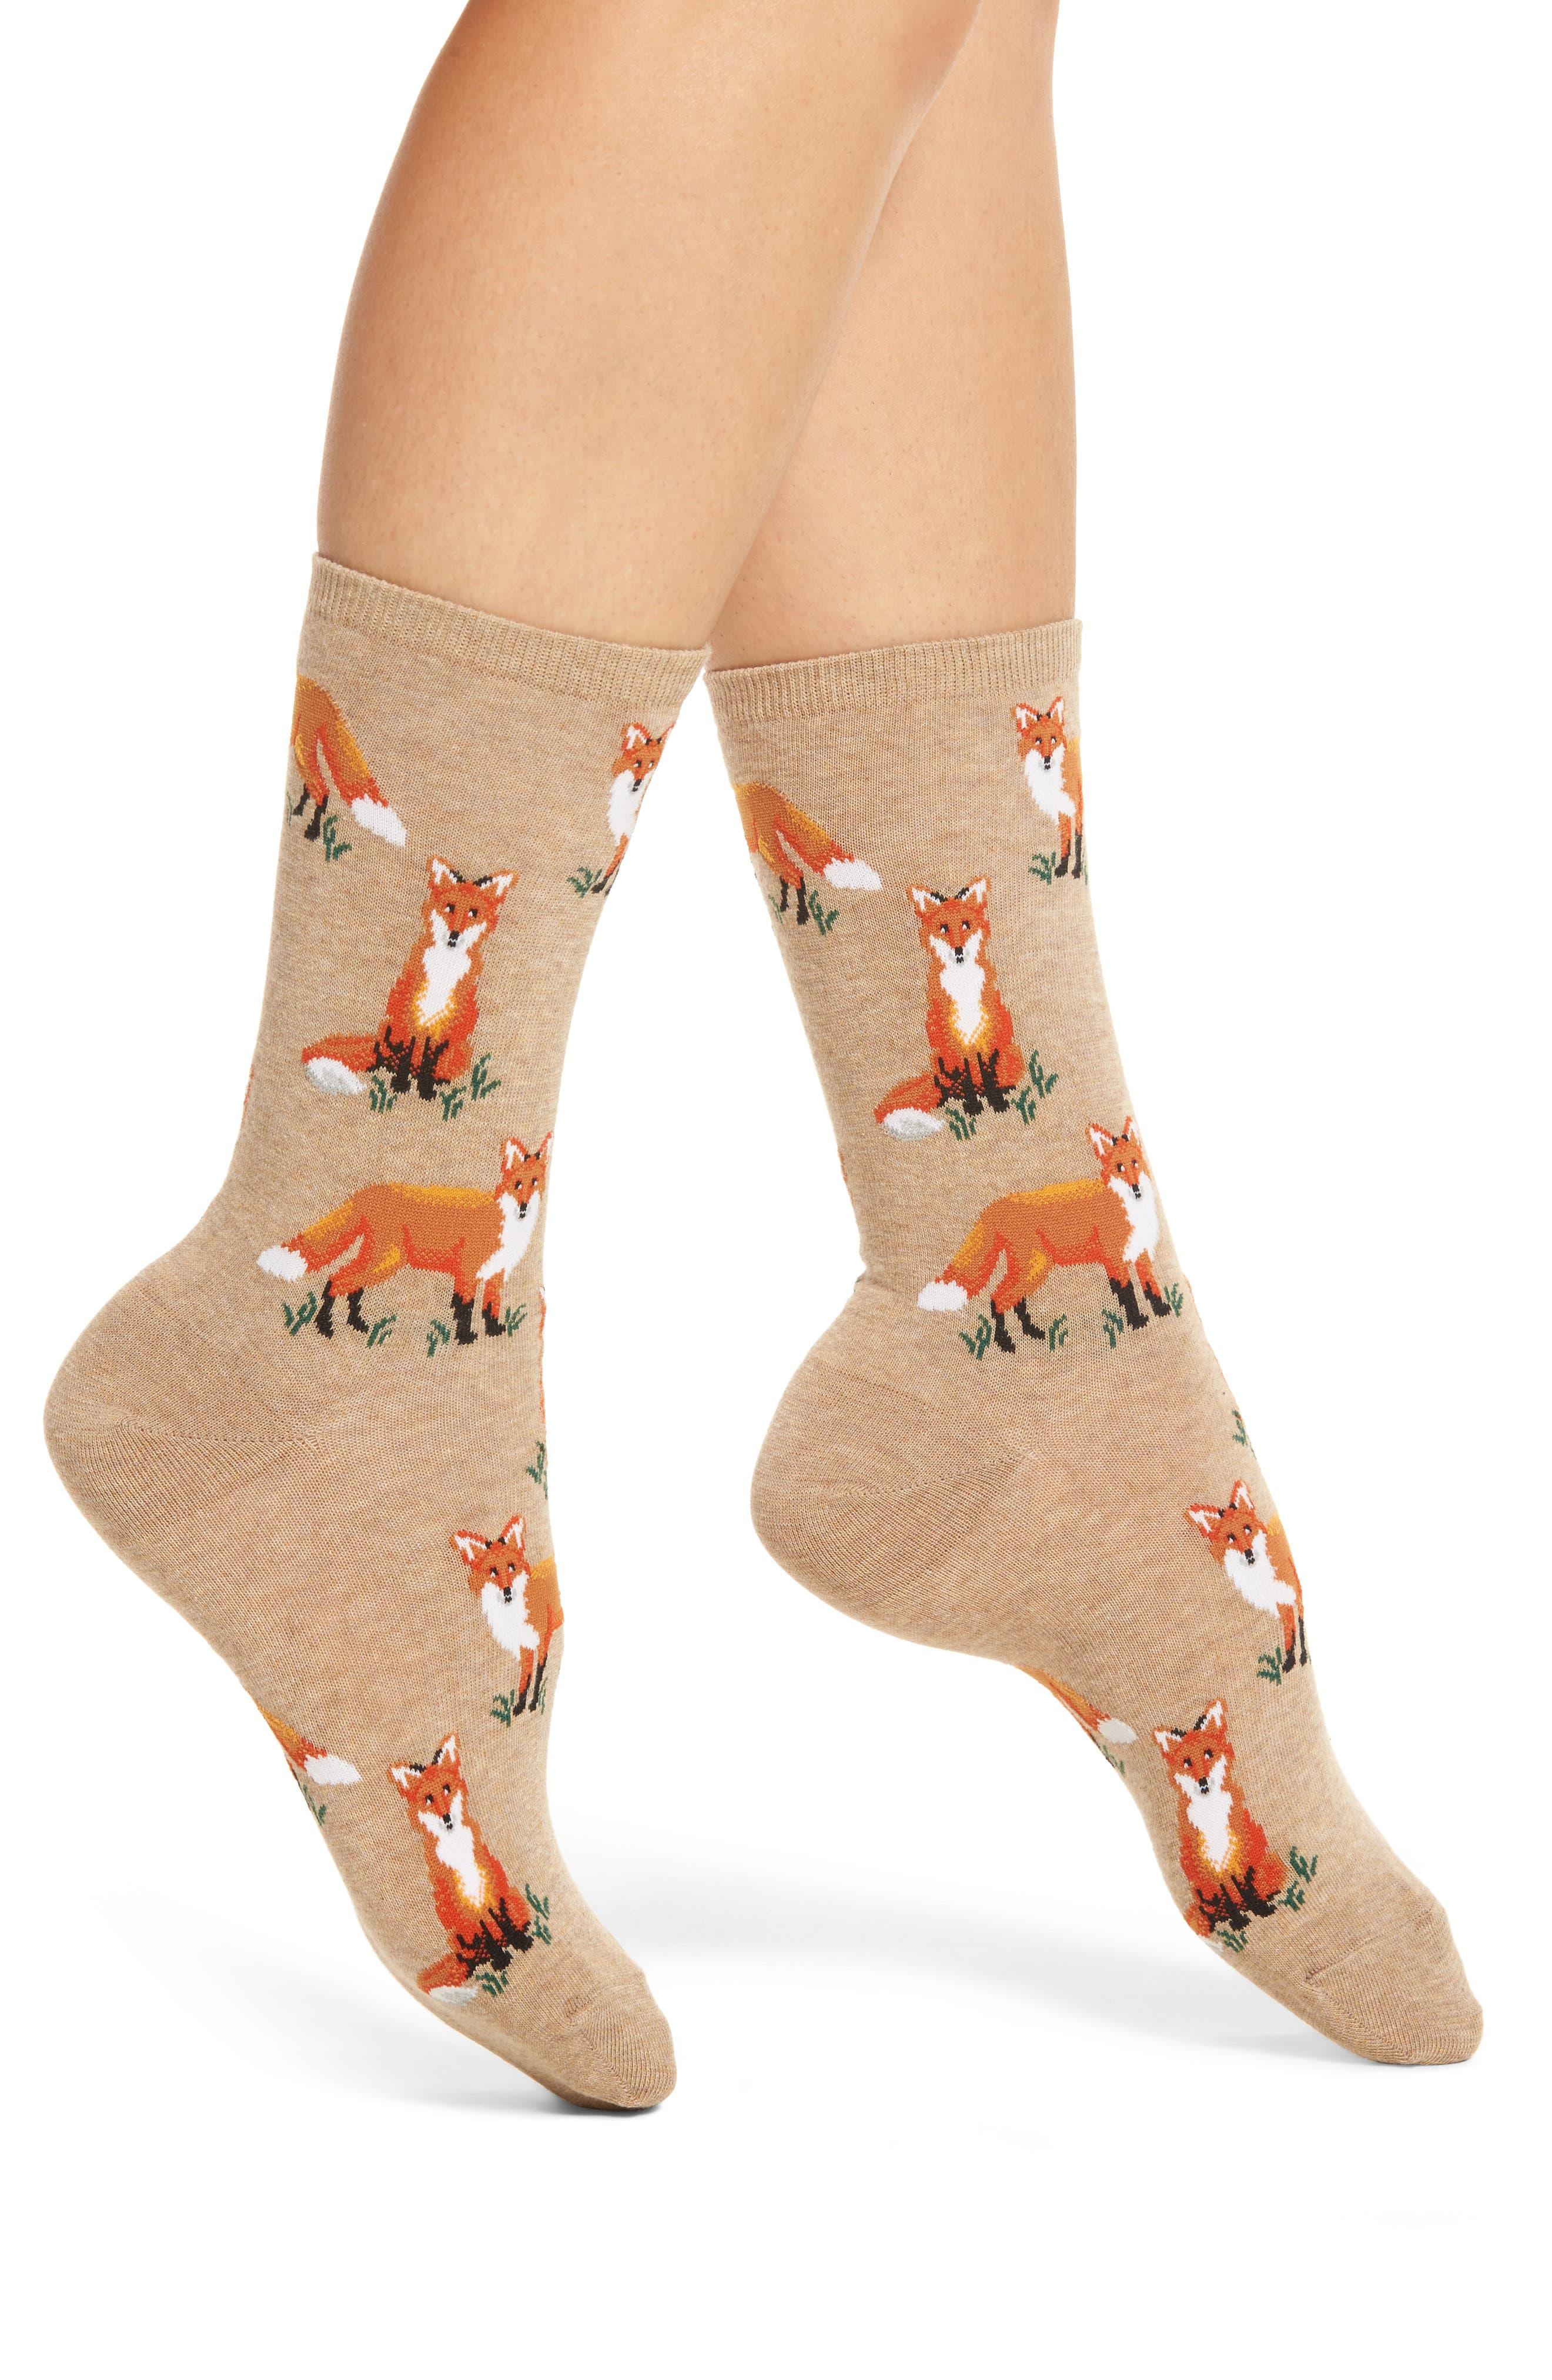 Fox Socks,                             Main thumbnail 1, color,                             130